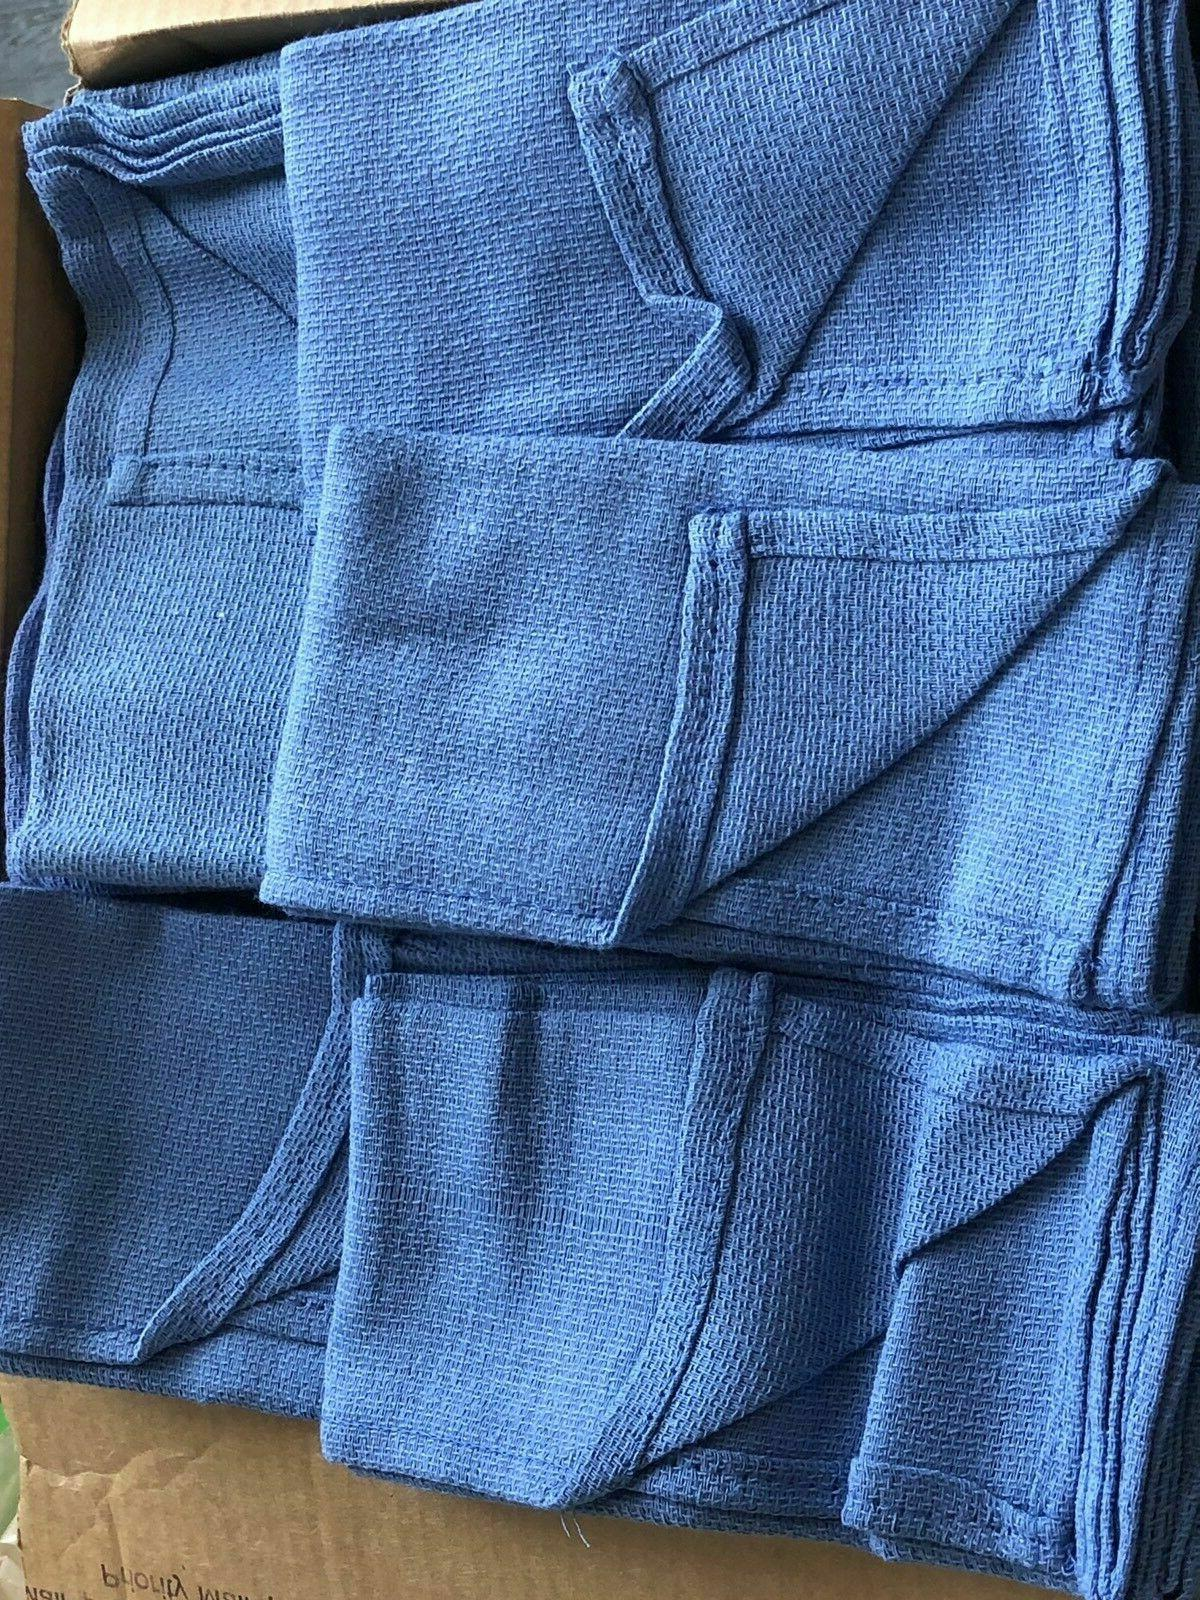 15PCS 100%Cotton towels Dish